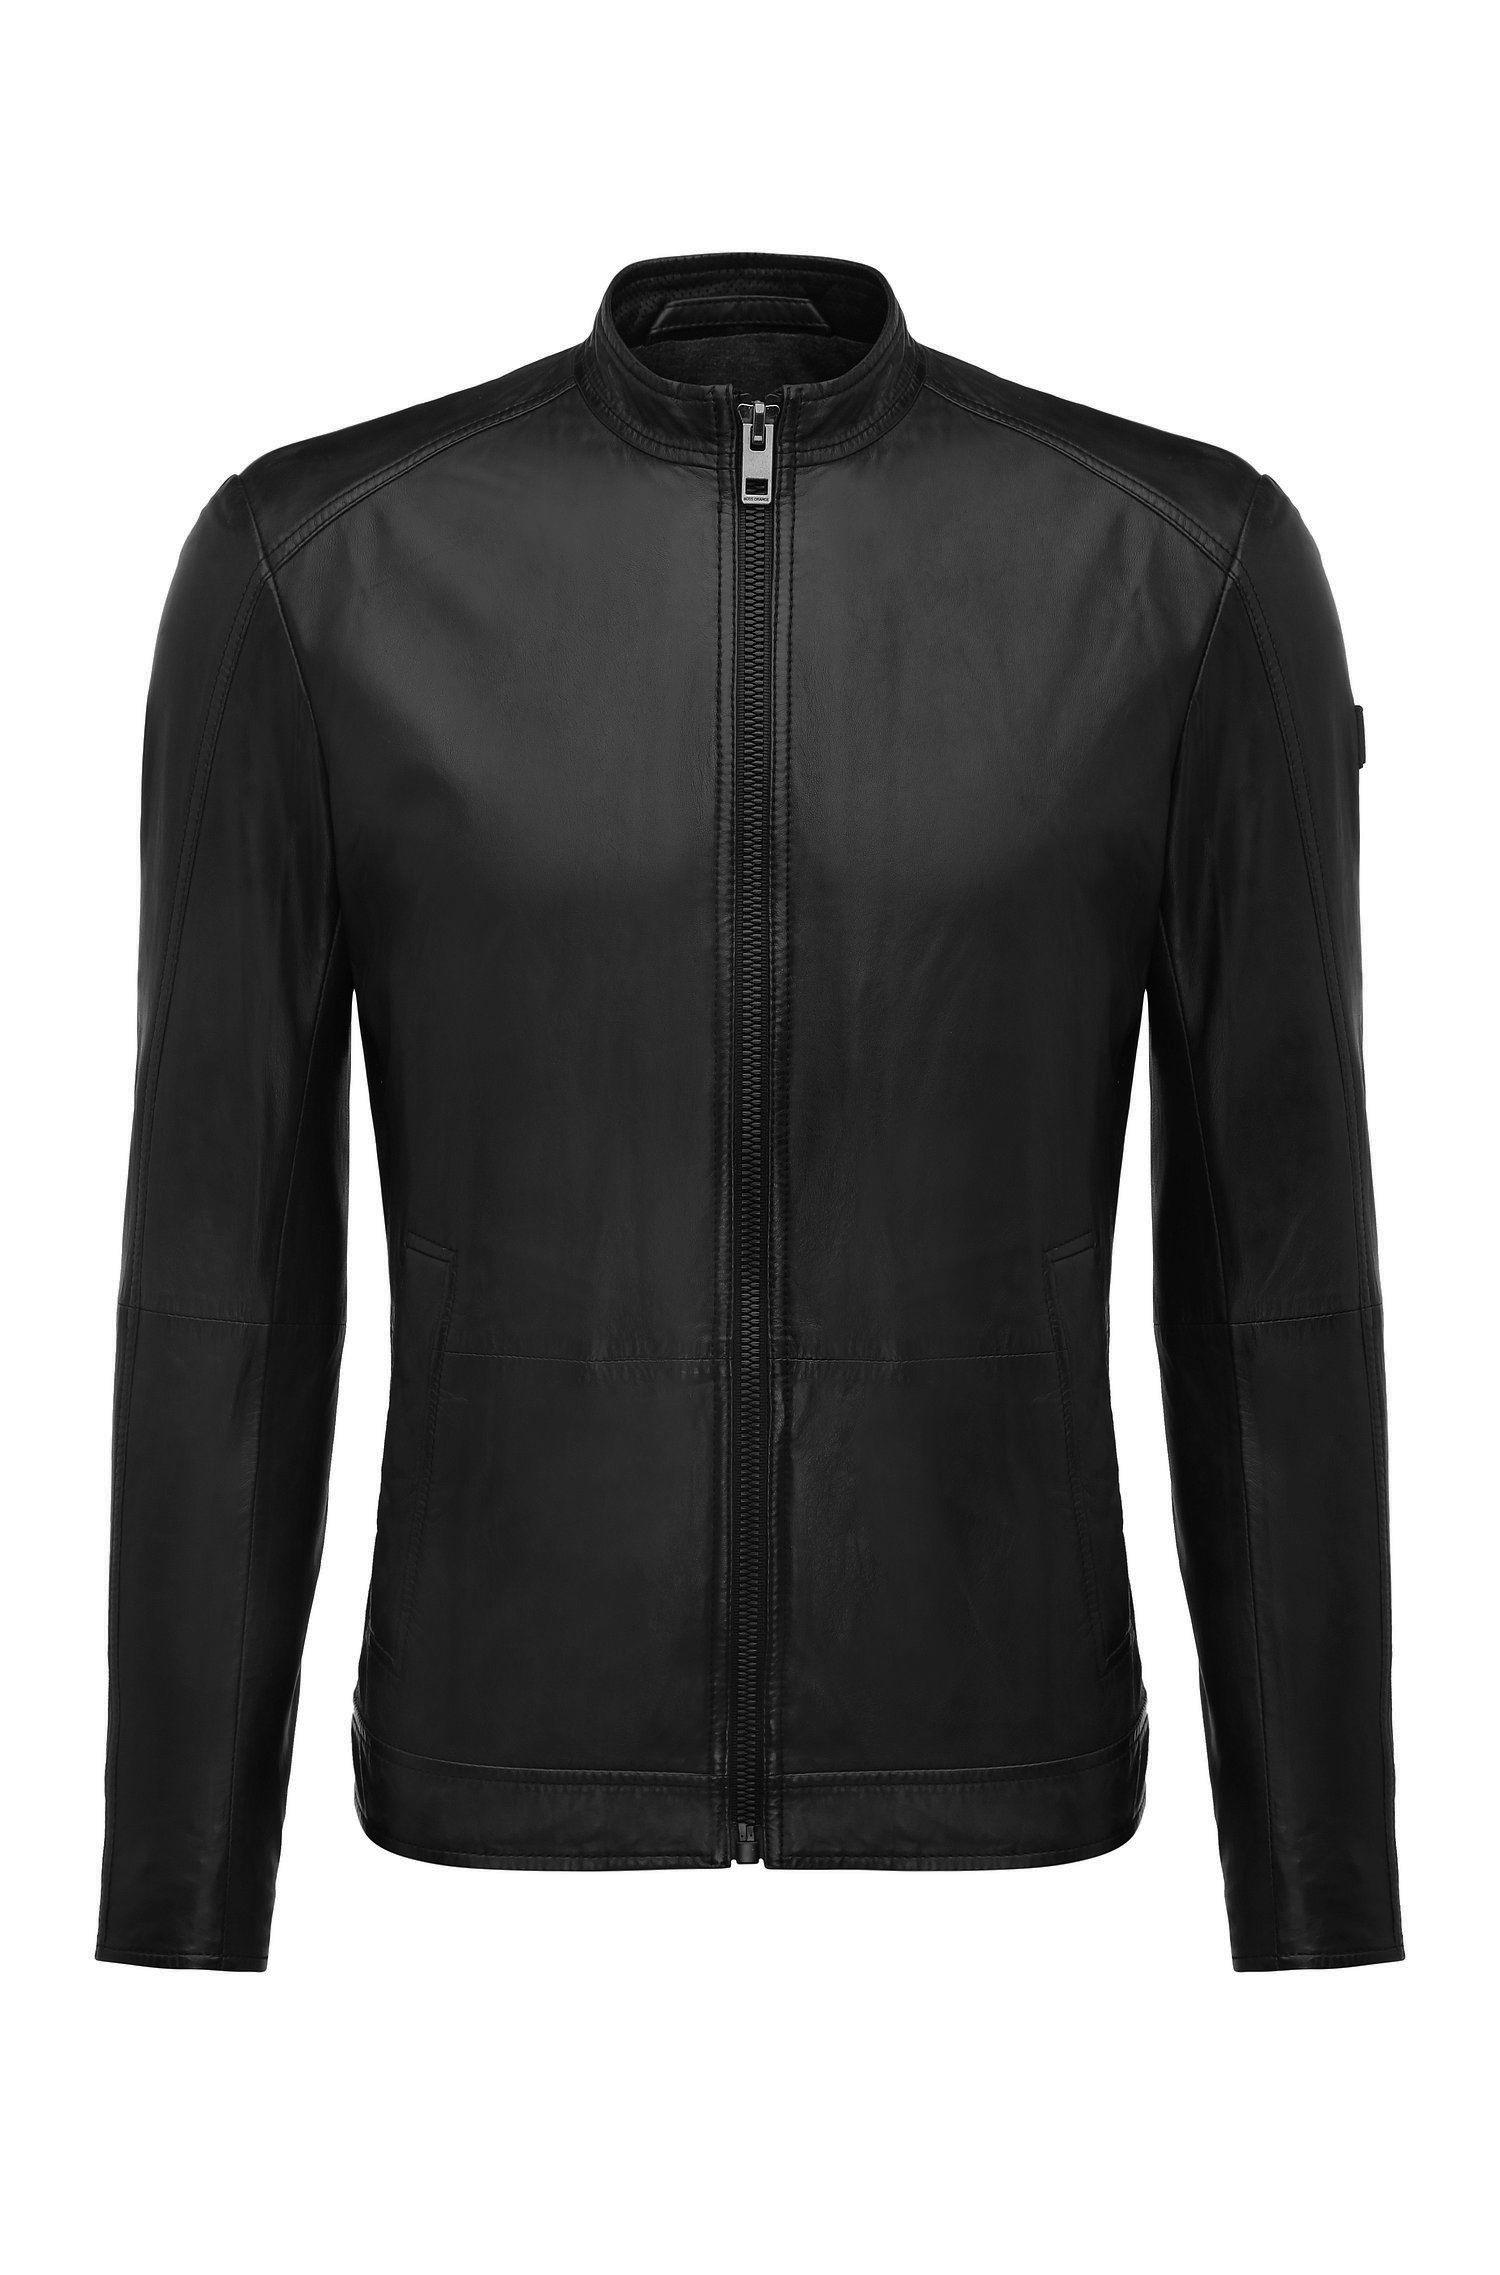 'Joker' | Slim Fit, Nappa Leather Jacket